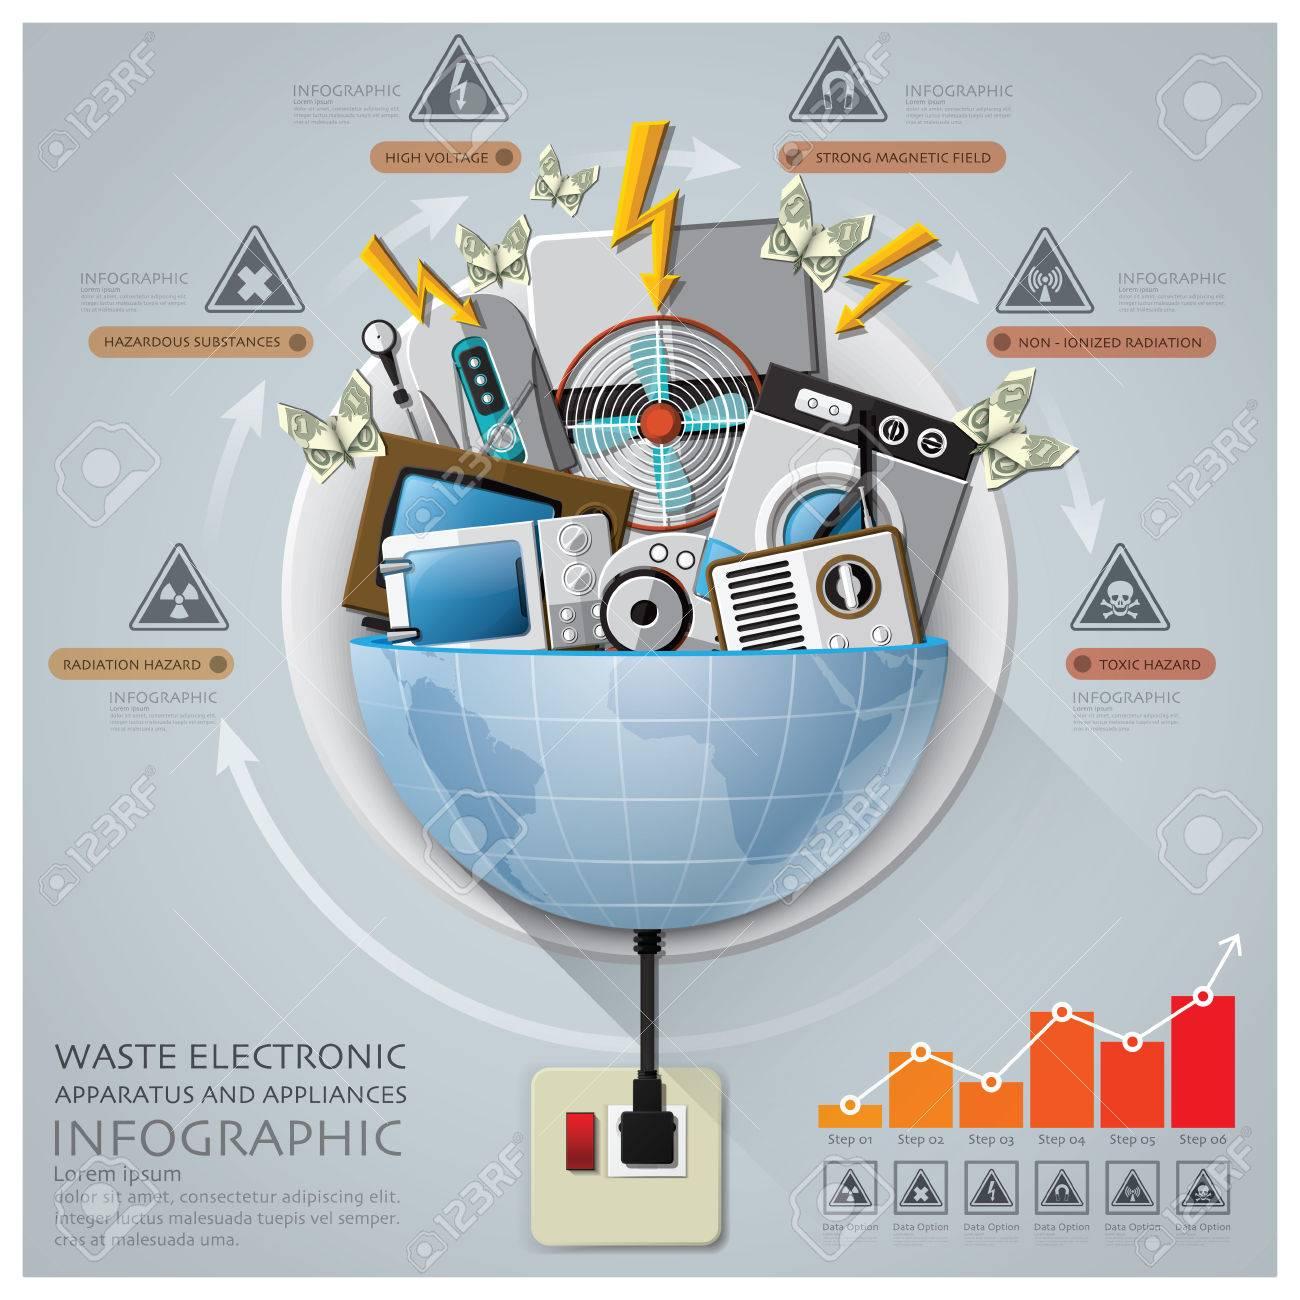 Atemberaubend Elektronisches Ikt Diagramm Ideen - Elektrische ...